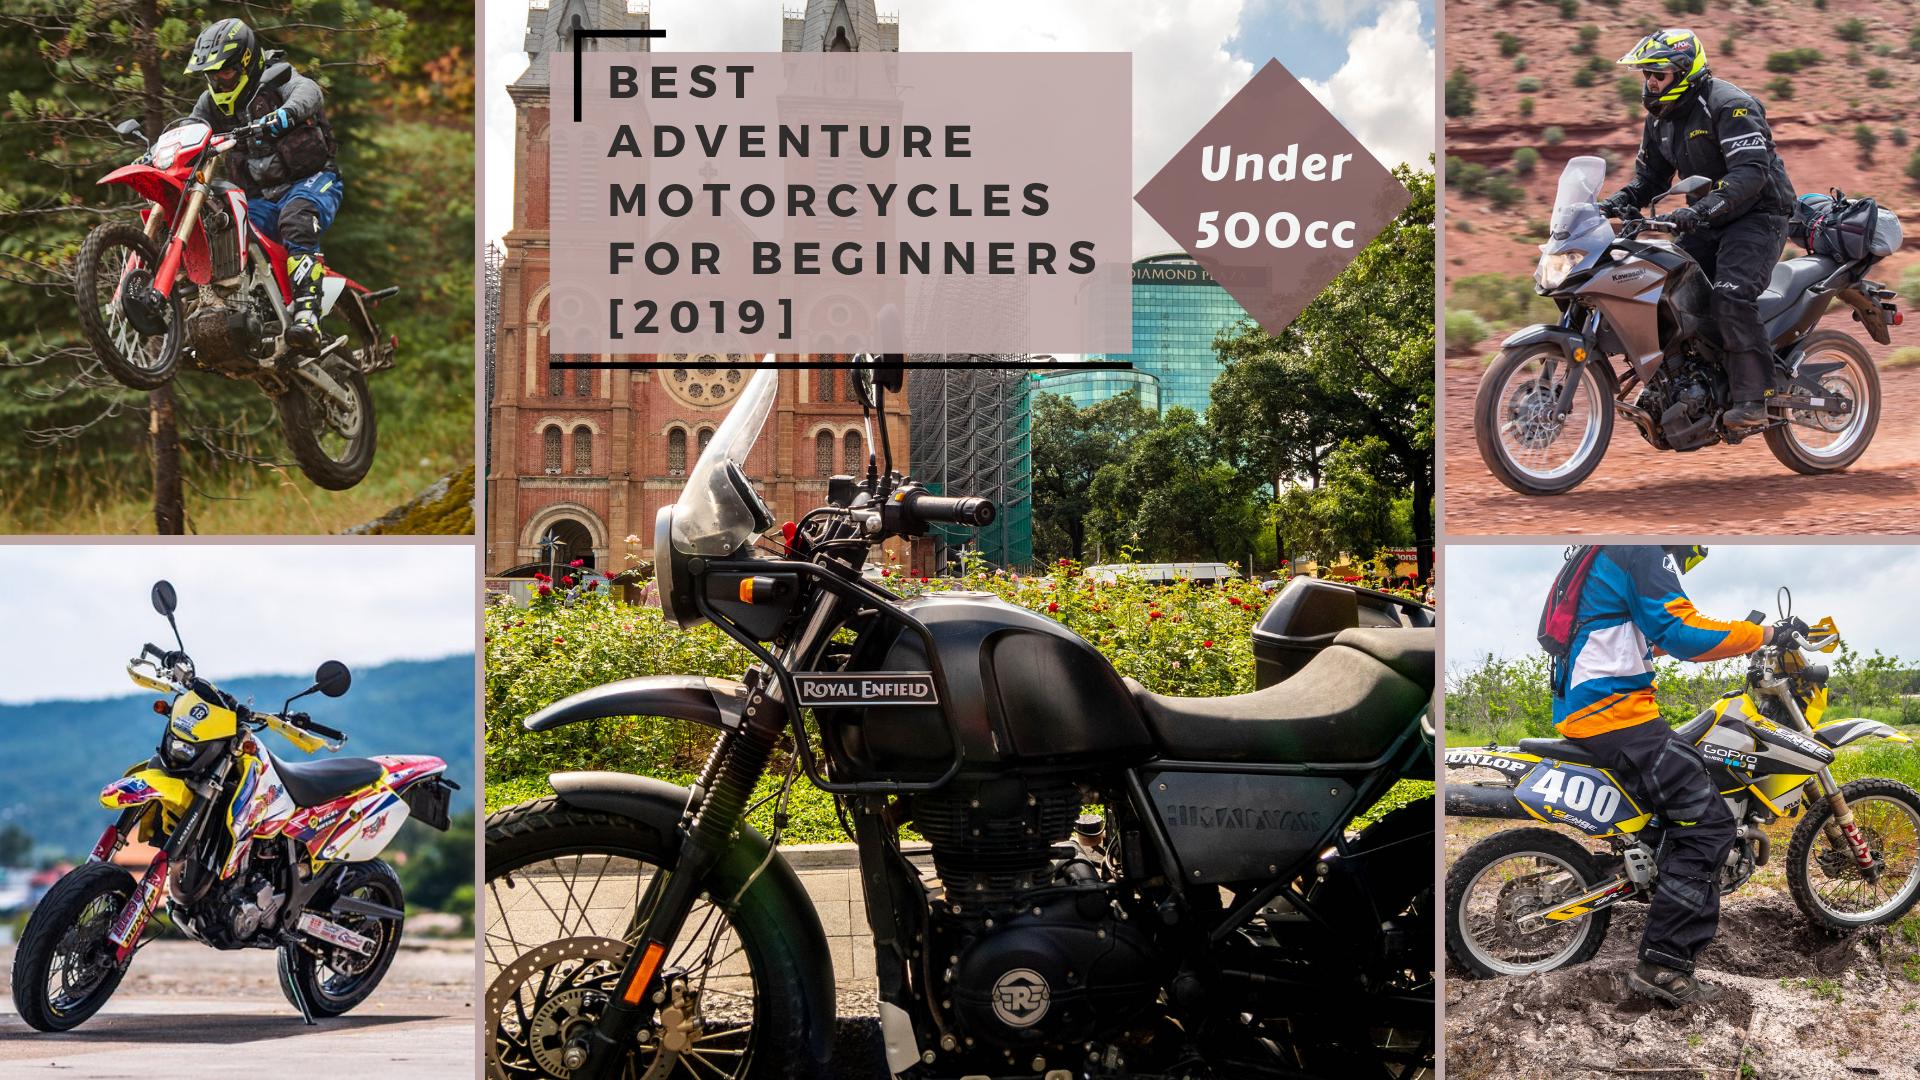 Best Adv Motorbikes For Beginners 2020 Under 500cc